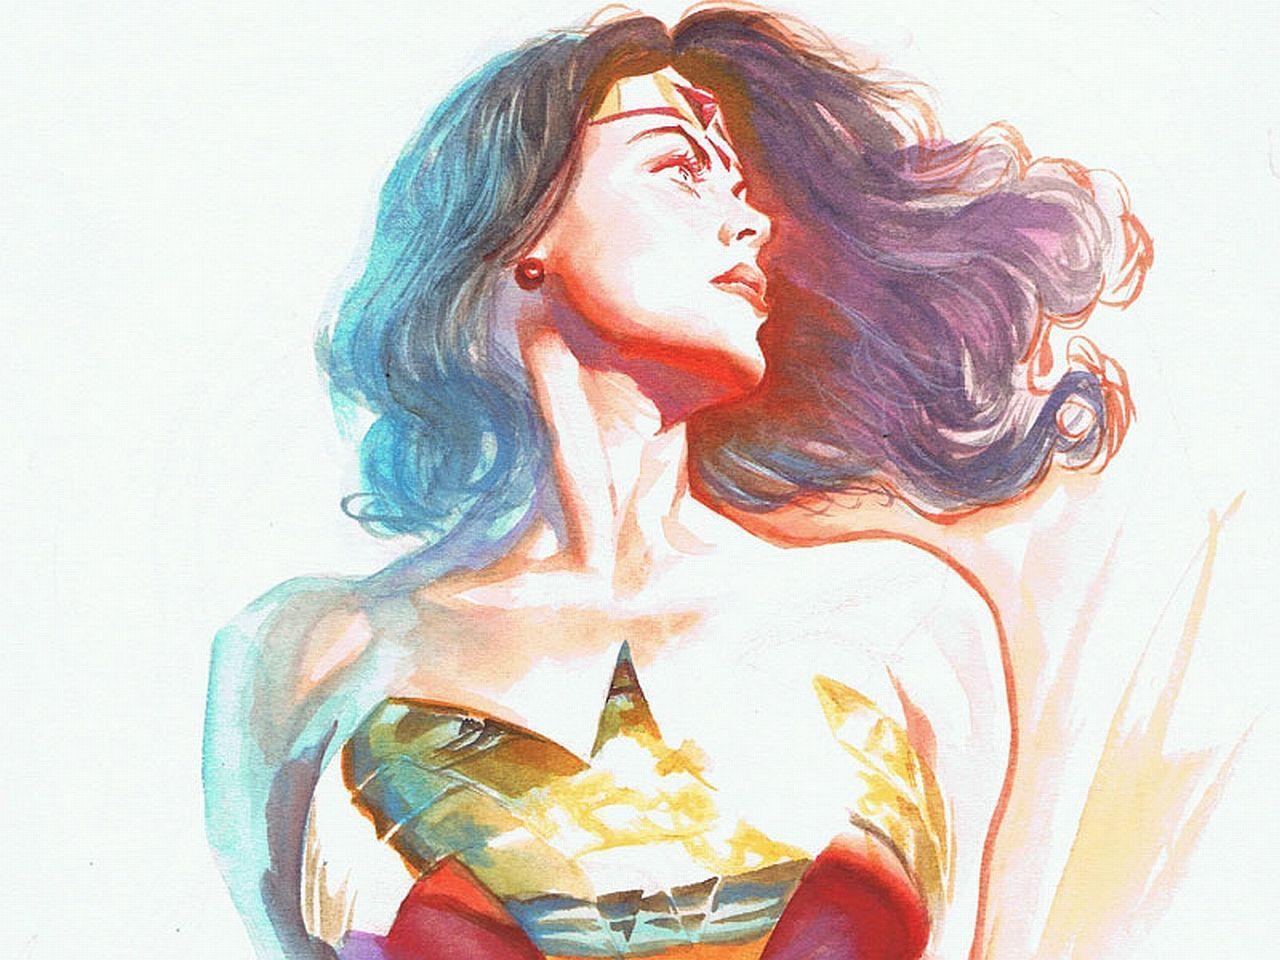 Wonder Woman Computer Wallpapers, Desktop Backgrounds | 1280x960 ...